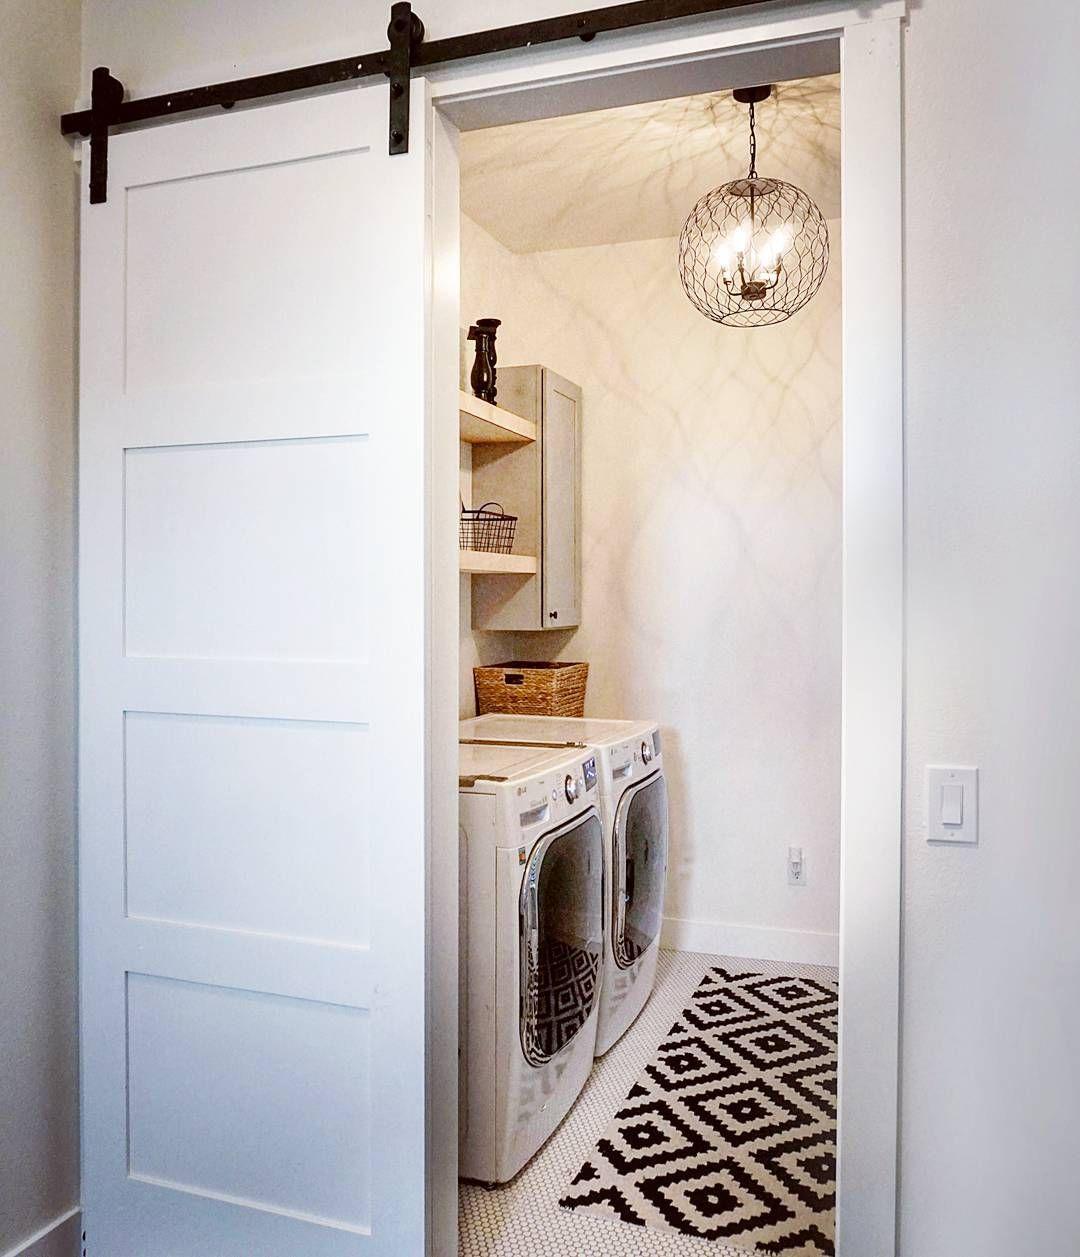 Cool 35 Inspiring Small Laundry Room Design Ideas Https://homeylife.com/